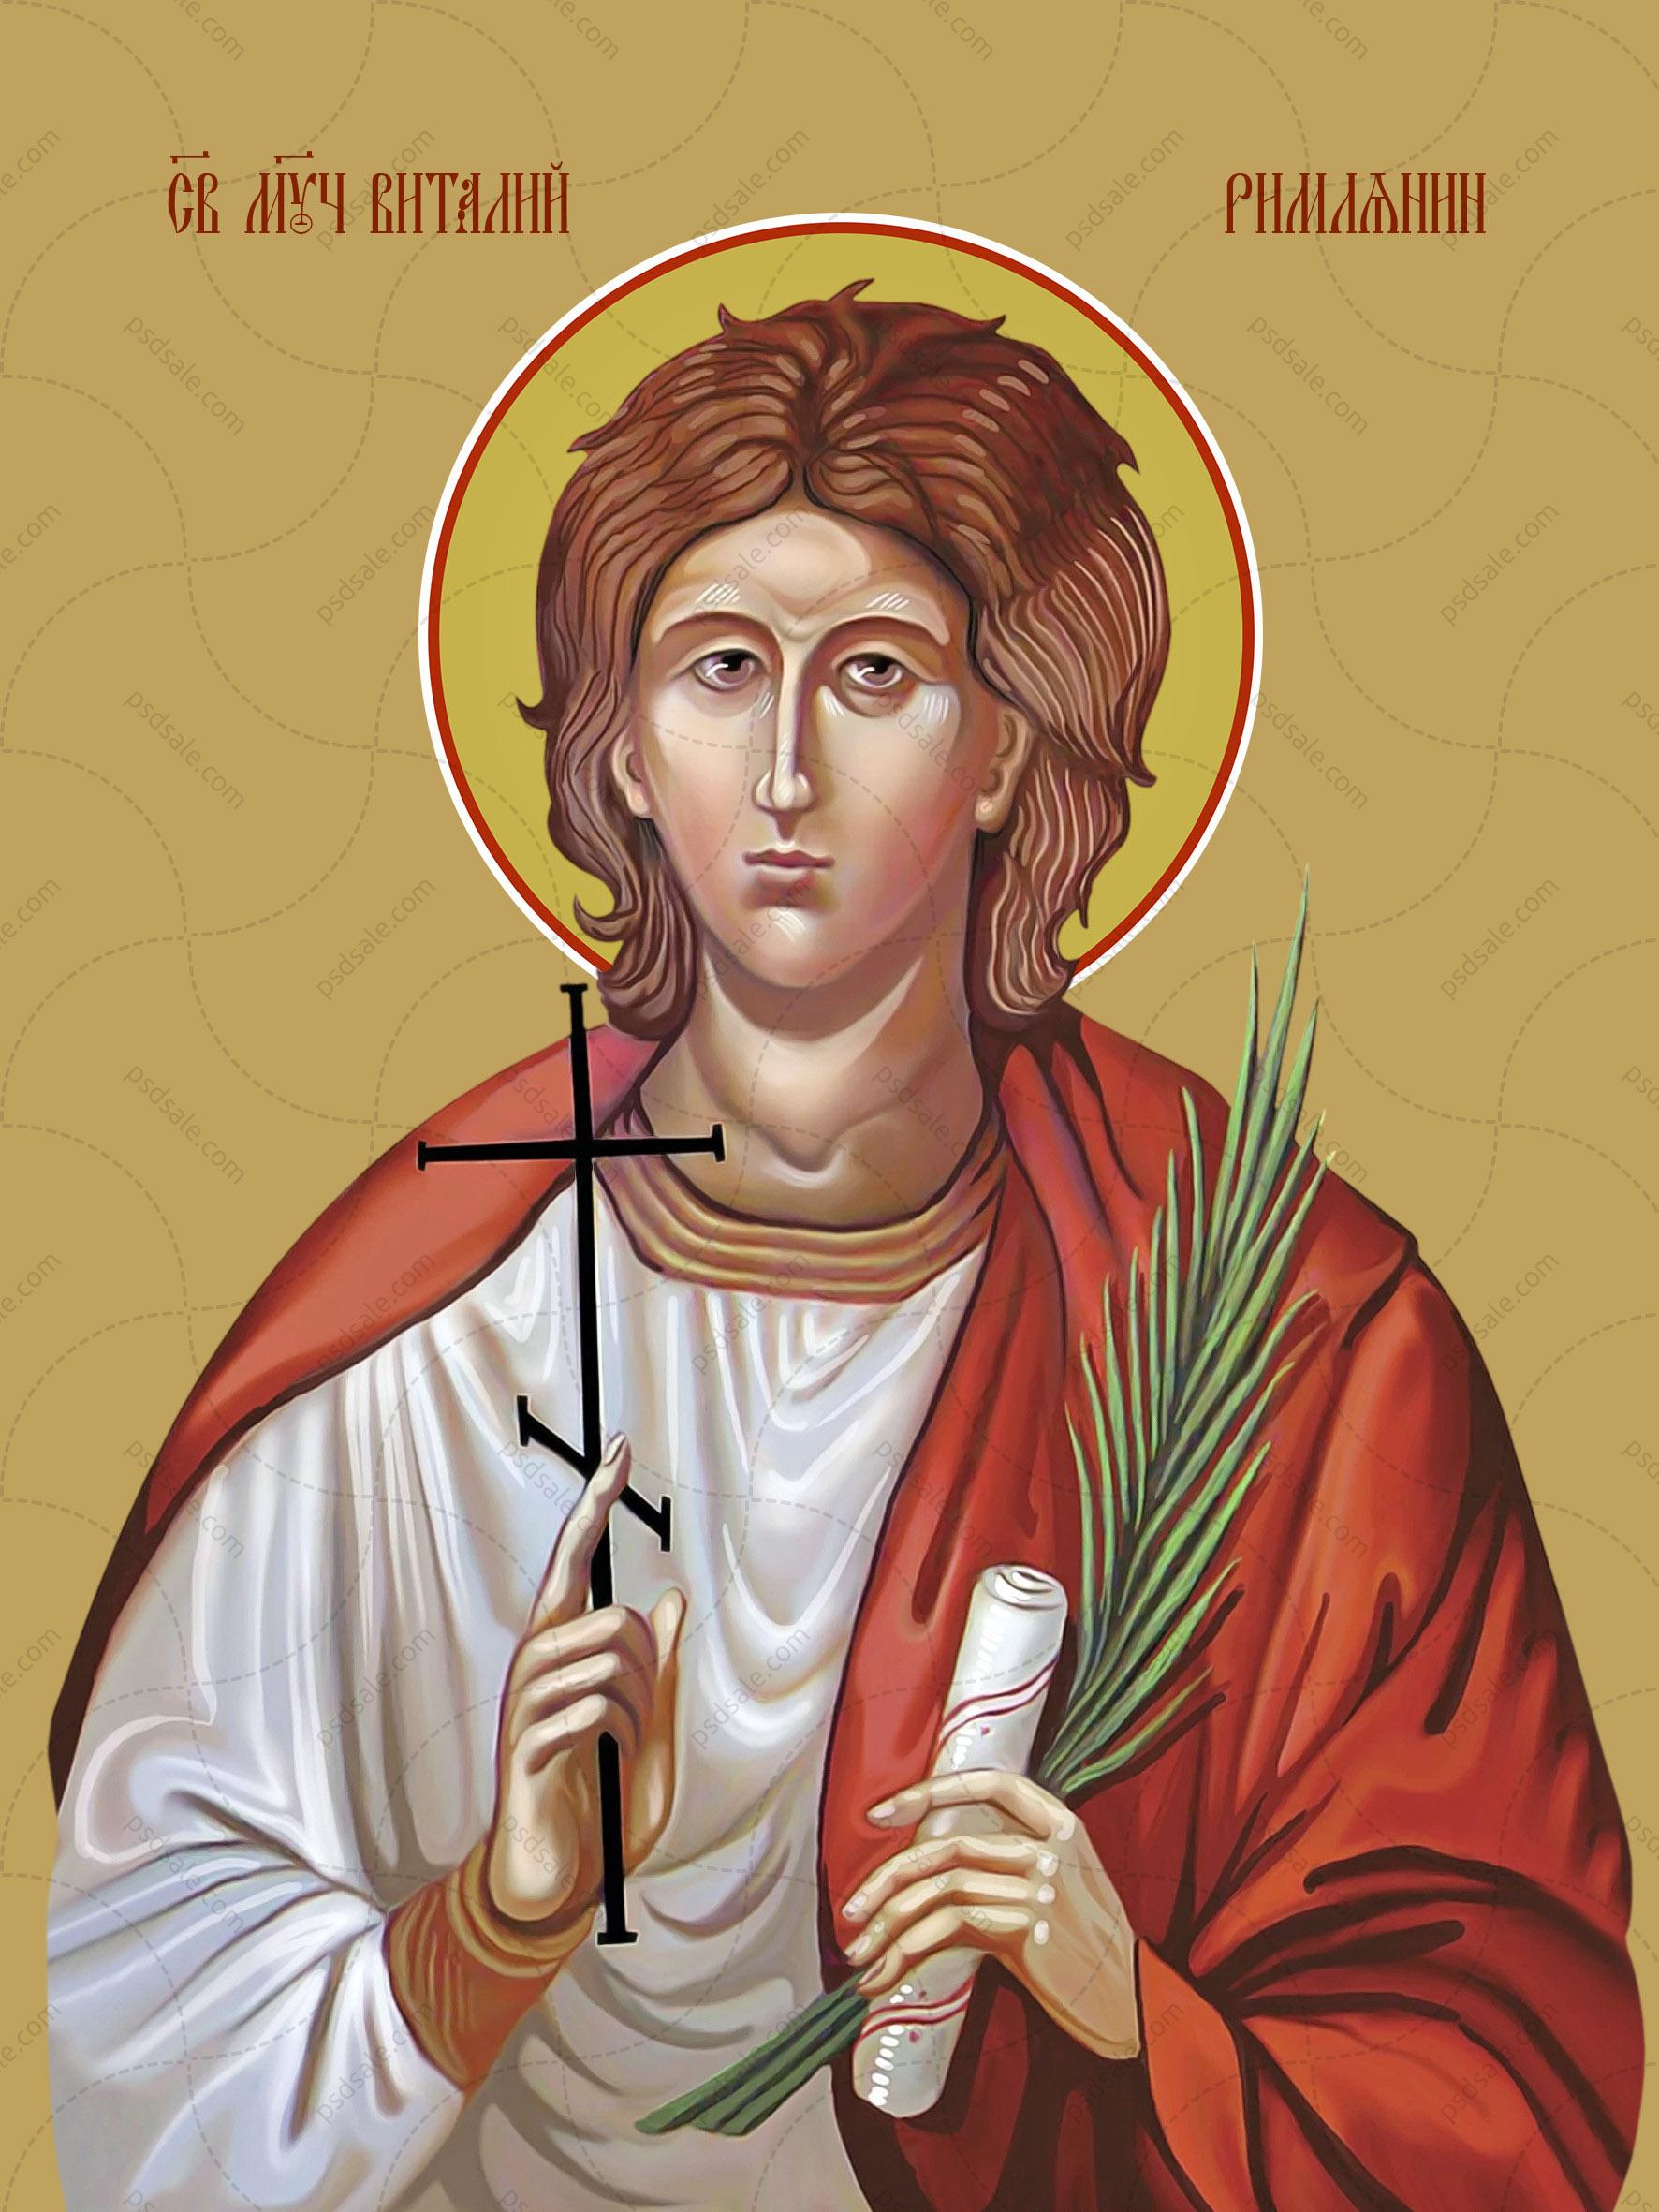 Виталий Римлянин, мученик